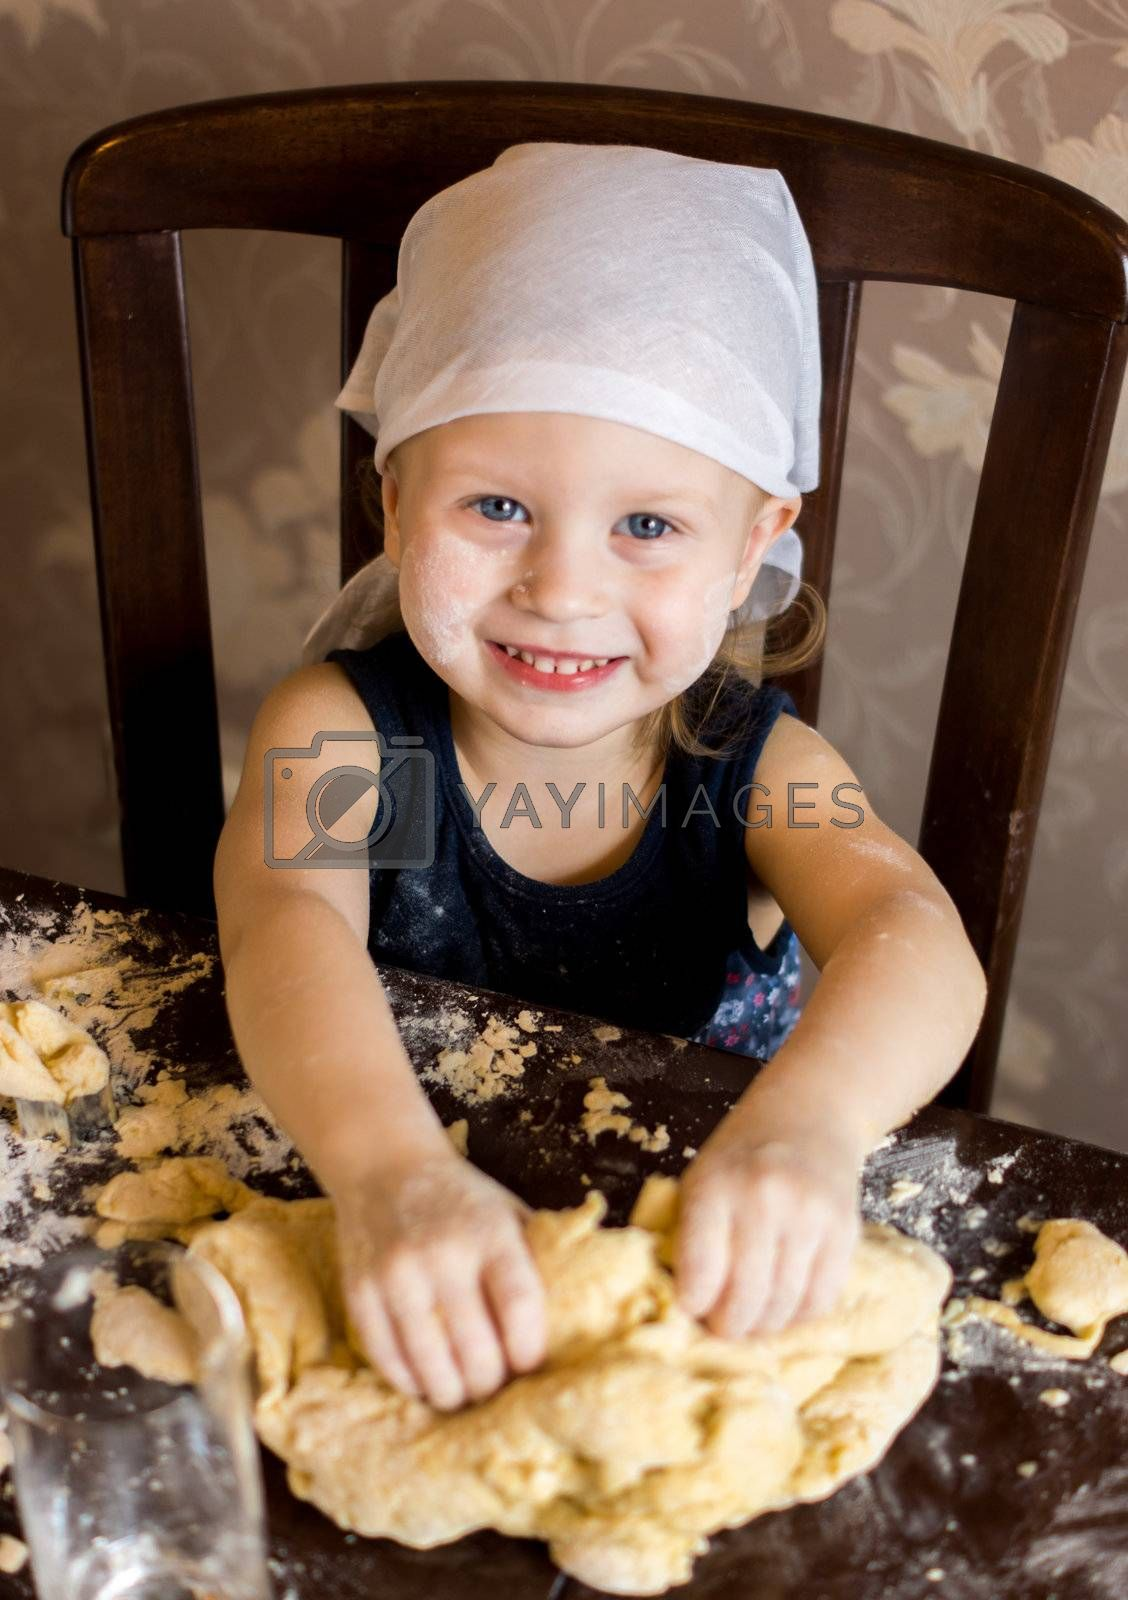 pretty little girl having fun kneads dough